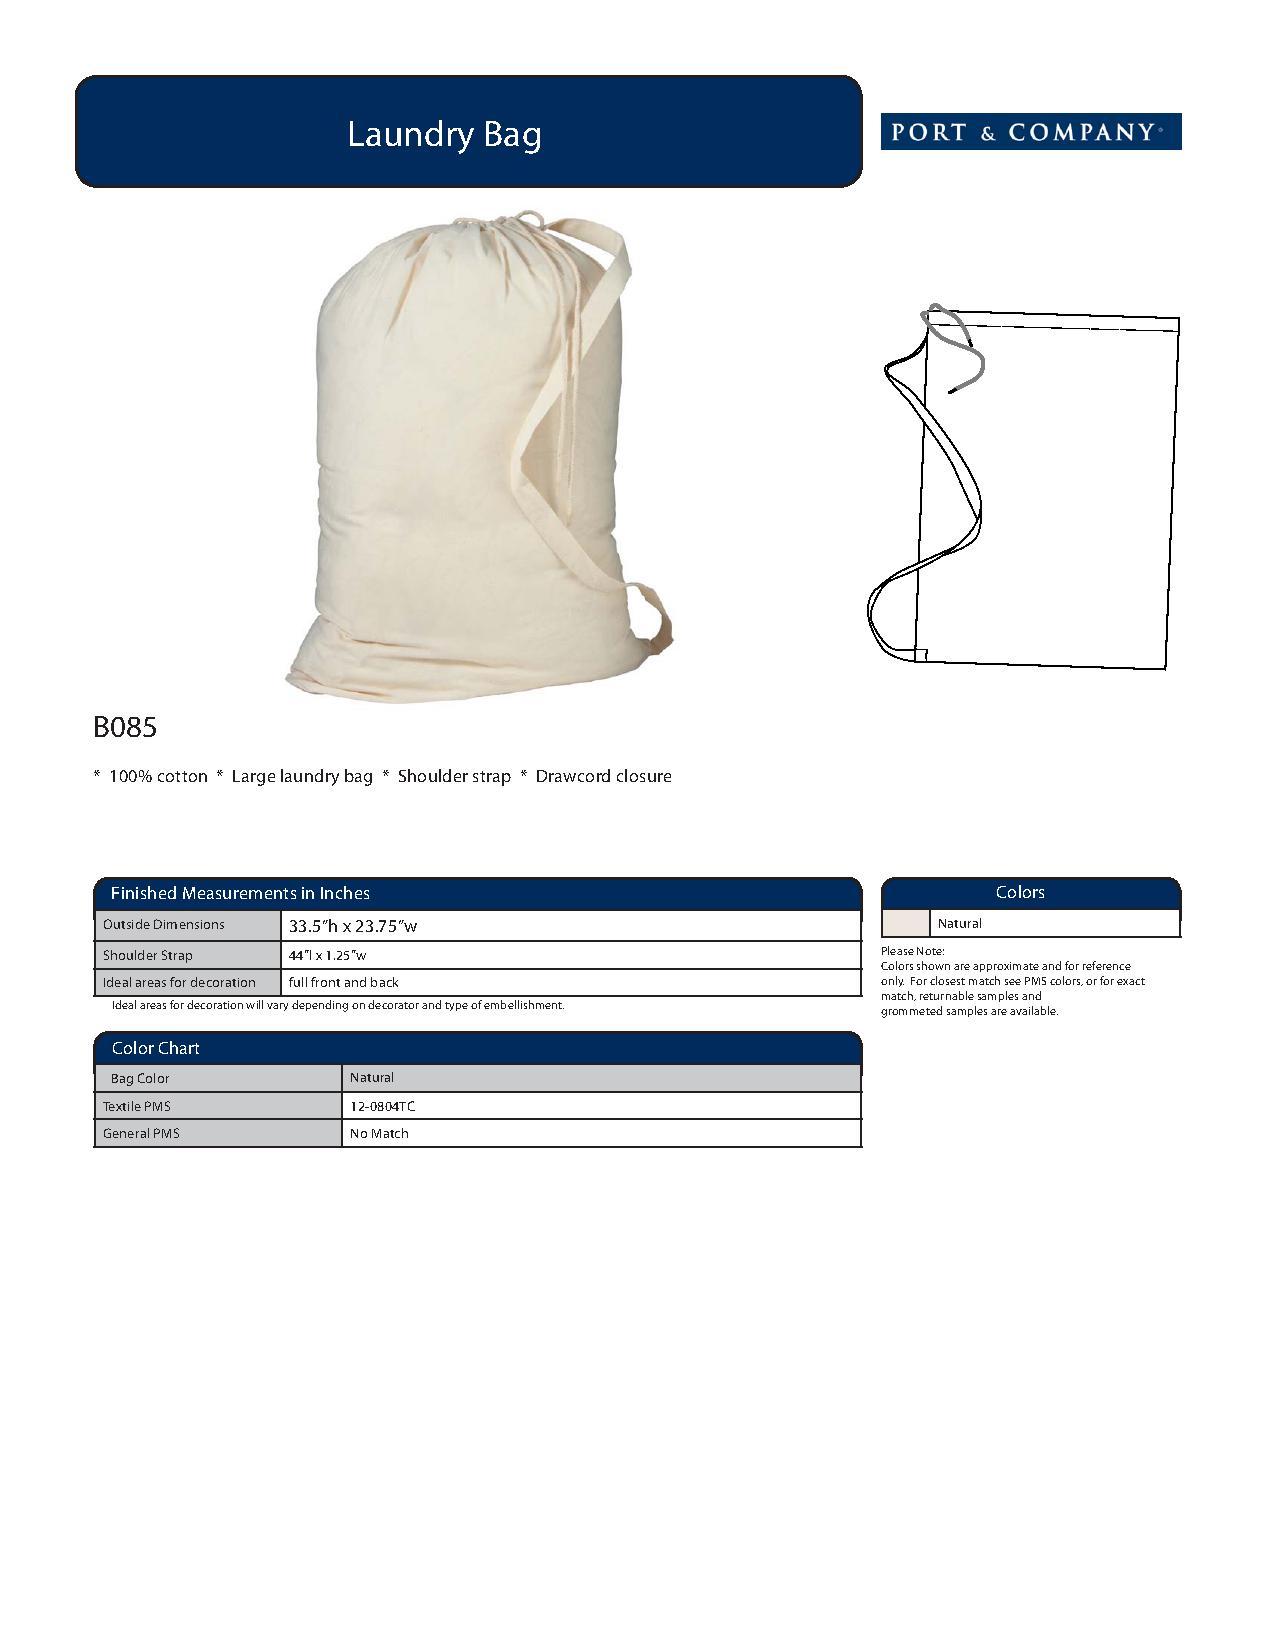 Port company b085 laundry bag accessories specs sizing specs nvjuhfo Choice Image